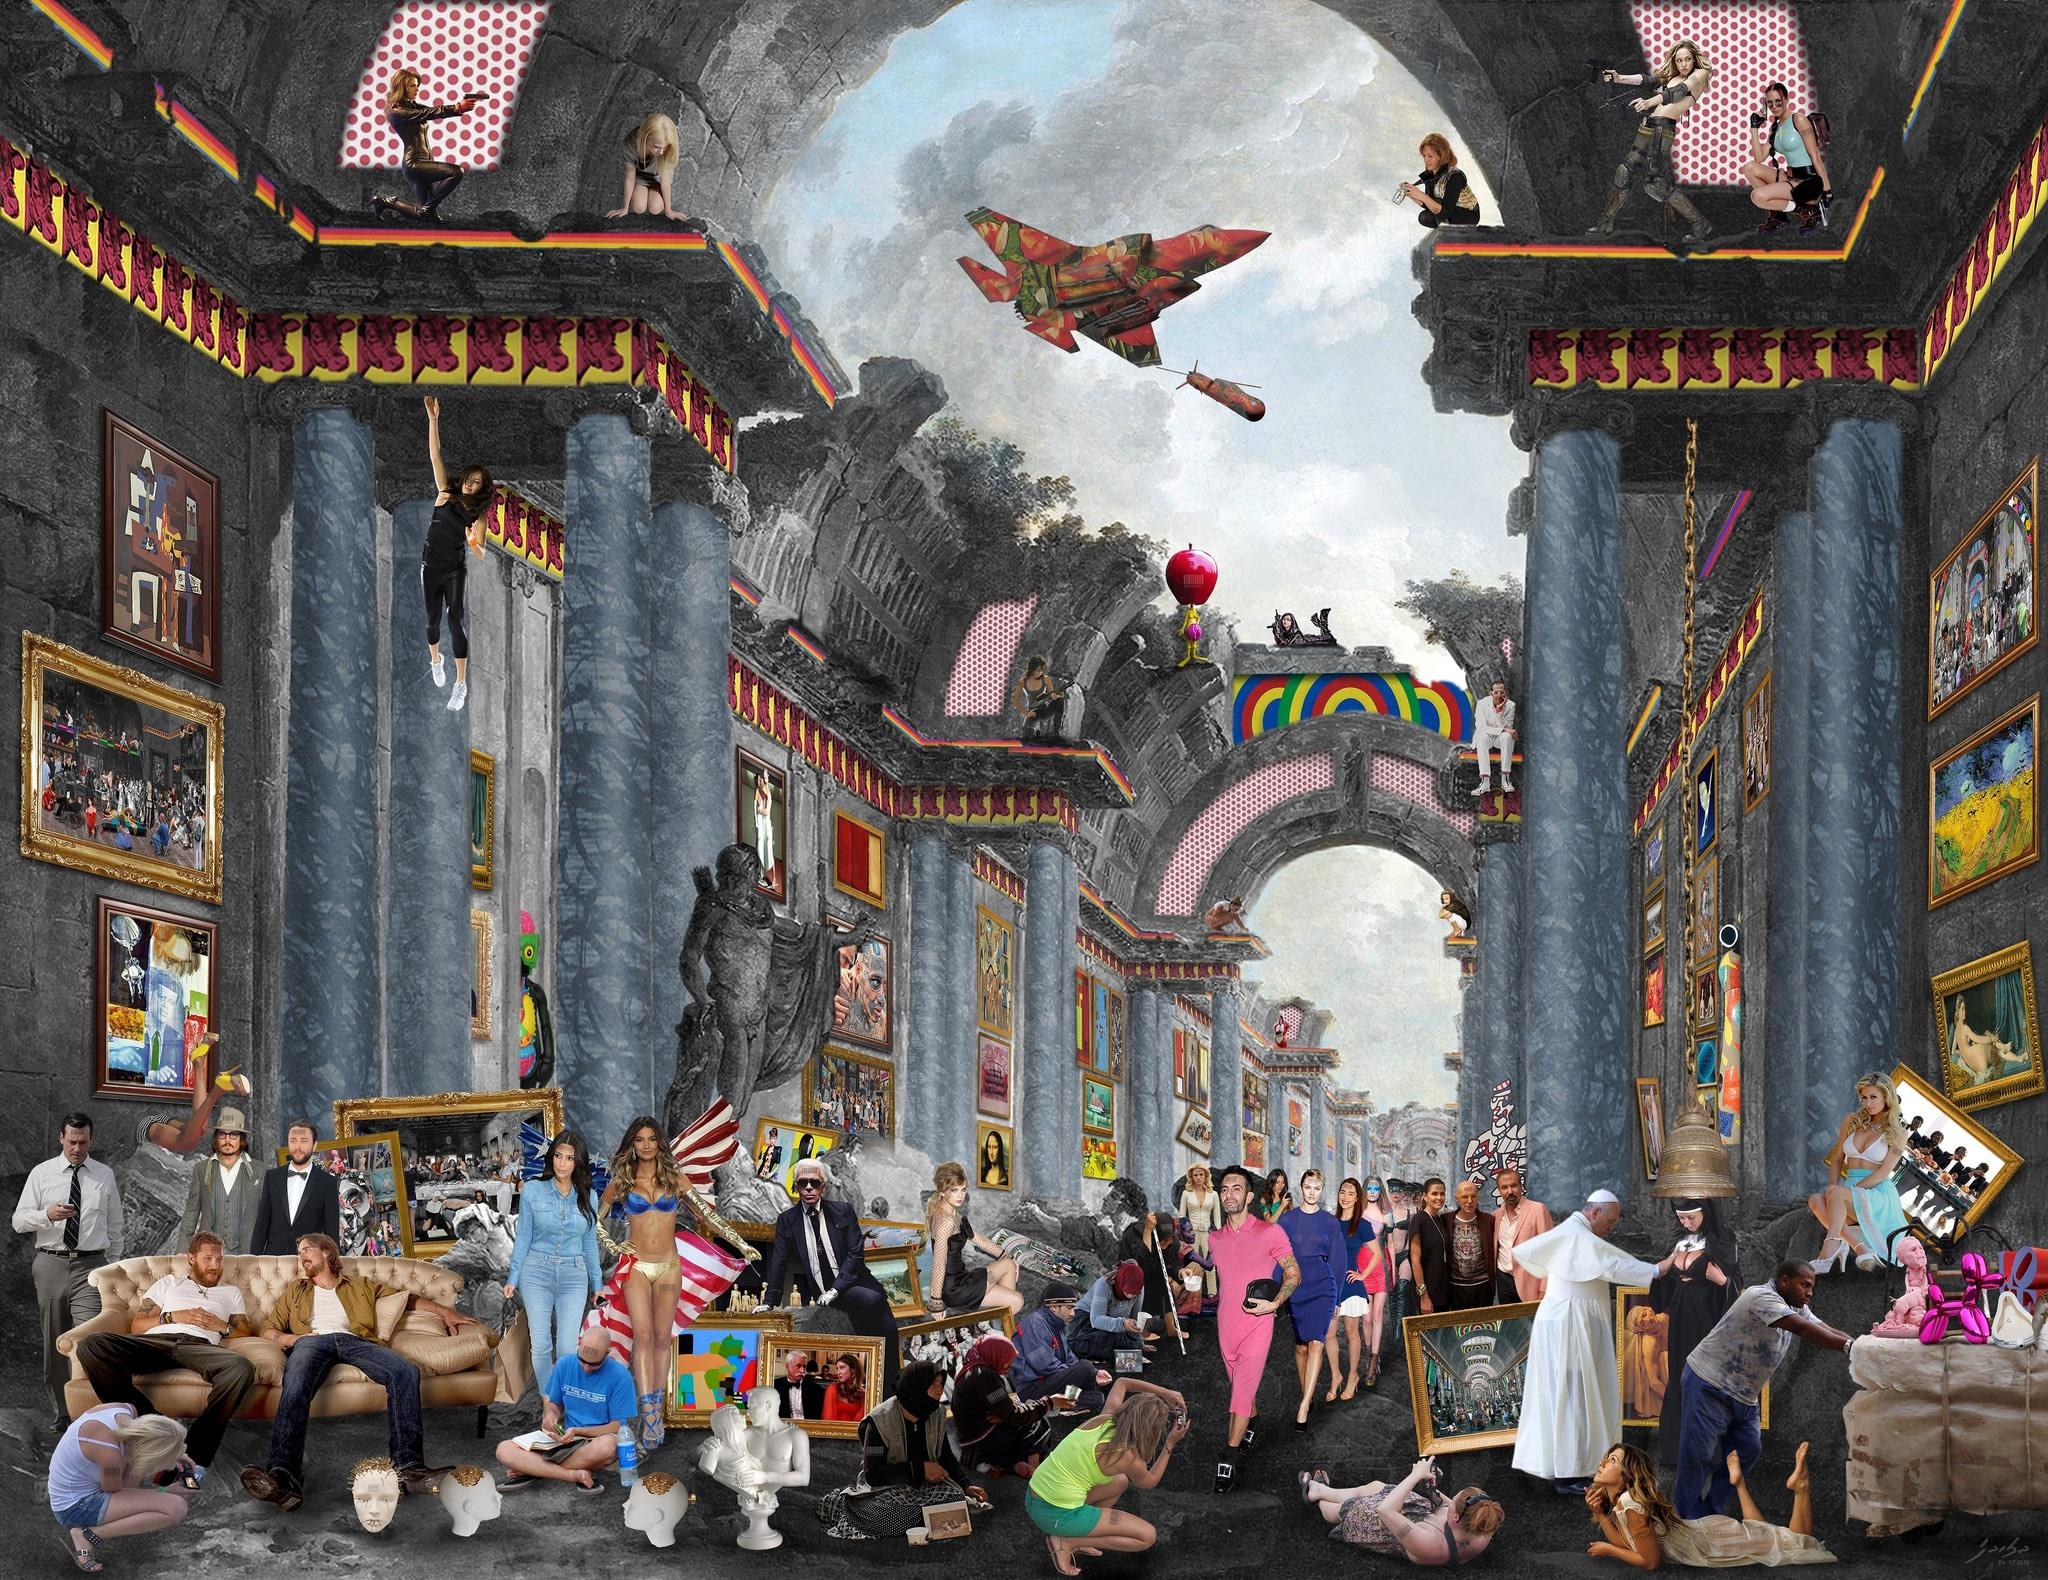 "<span class=""link fancybox-details-link""><a href=""/artists/30-lluis-barba/works/559/"">View Detail Page</a></span><div class=""artist""><strong>Lluís Barba</strong></div> <div class=""title""><em>Louvre in Ruins, Robert Hubert</em>, 2015</div> <div class=""medium"">C-Type Print, Diasec Mounted<br />  </div> <div class=""dimensions"">181.1 x 242.1 cm<br />71 1/4 x 95 1/4 in.</div> <div class=""edition_details"">Edition of 6</div><div class=""copyright_line"">Copyright The Artist</div>"